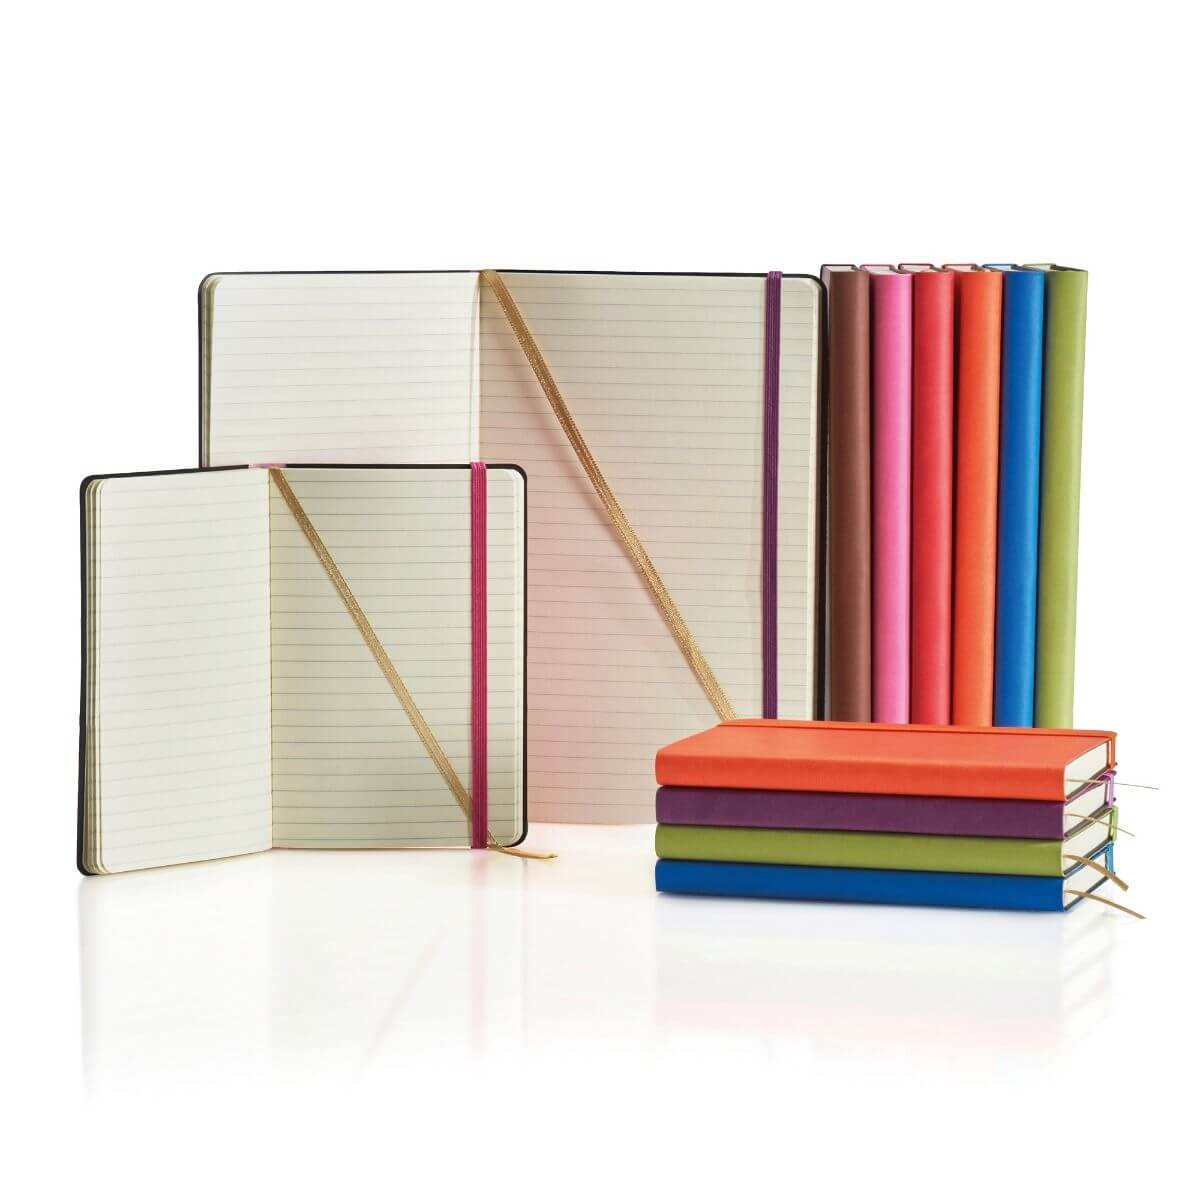 Branded Castelli Tucson Flexible Notebooks - Rapid Notes